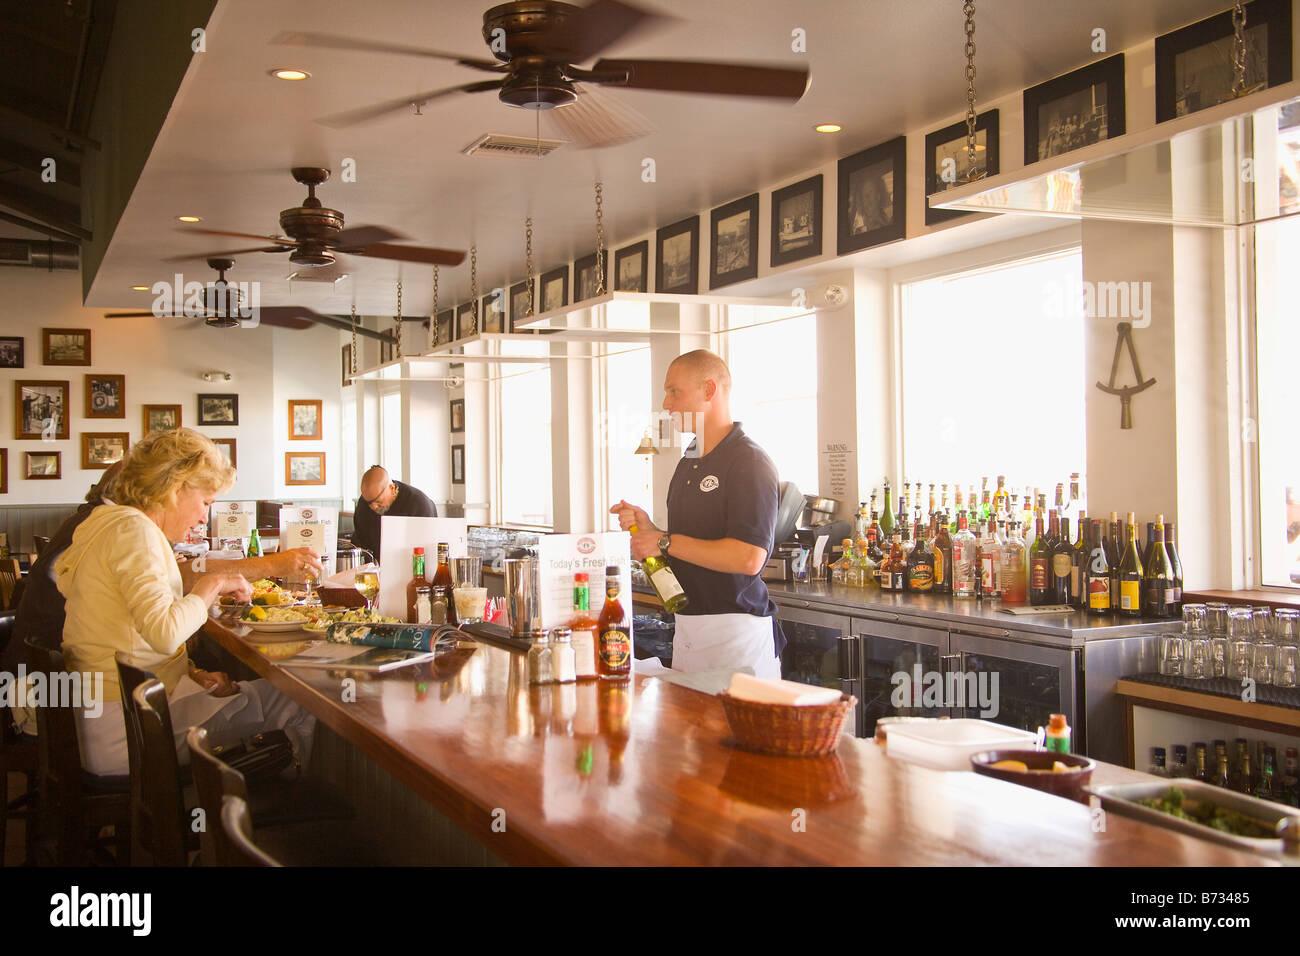 visitors dine at Brophy Bros Restaurant and Clam Bar Ventura Harbor Ventura California - Stock Image